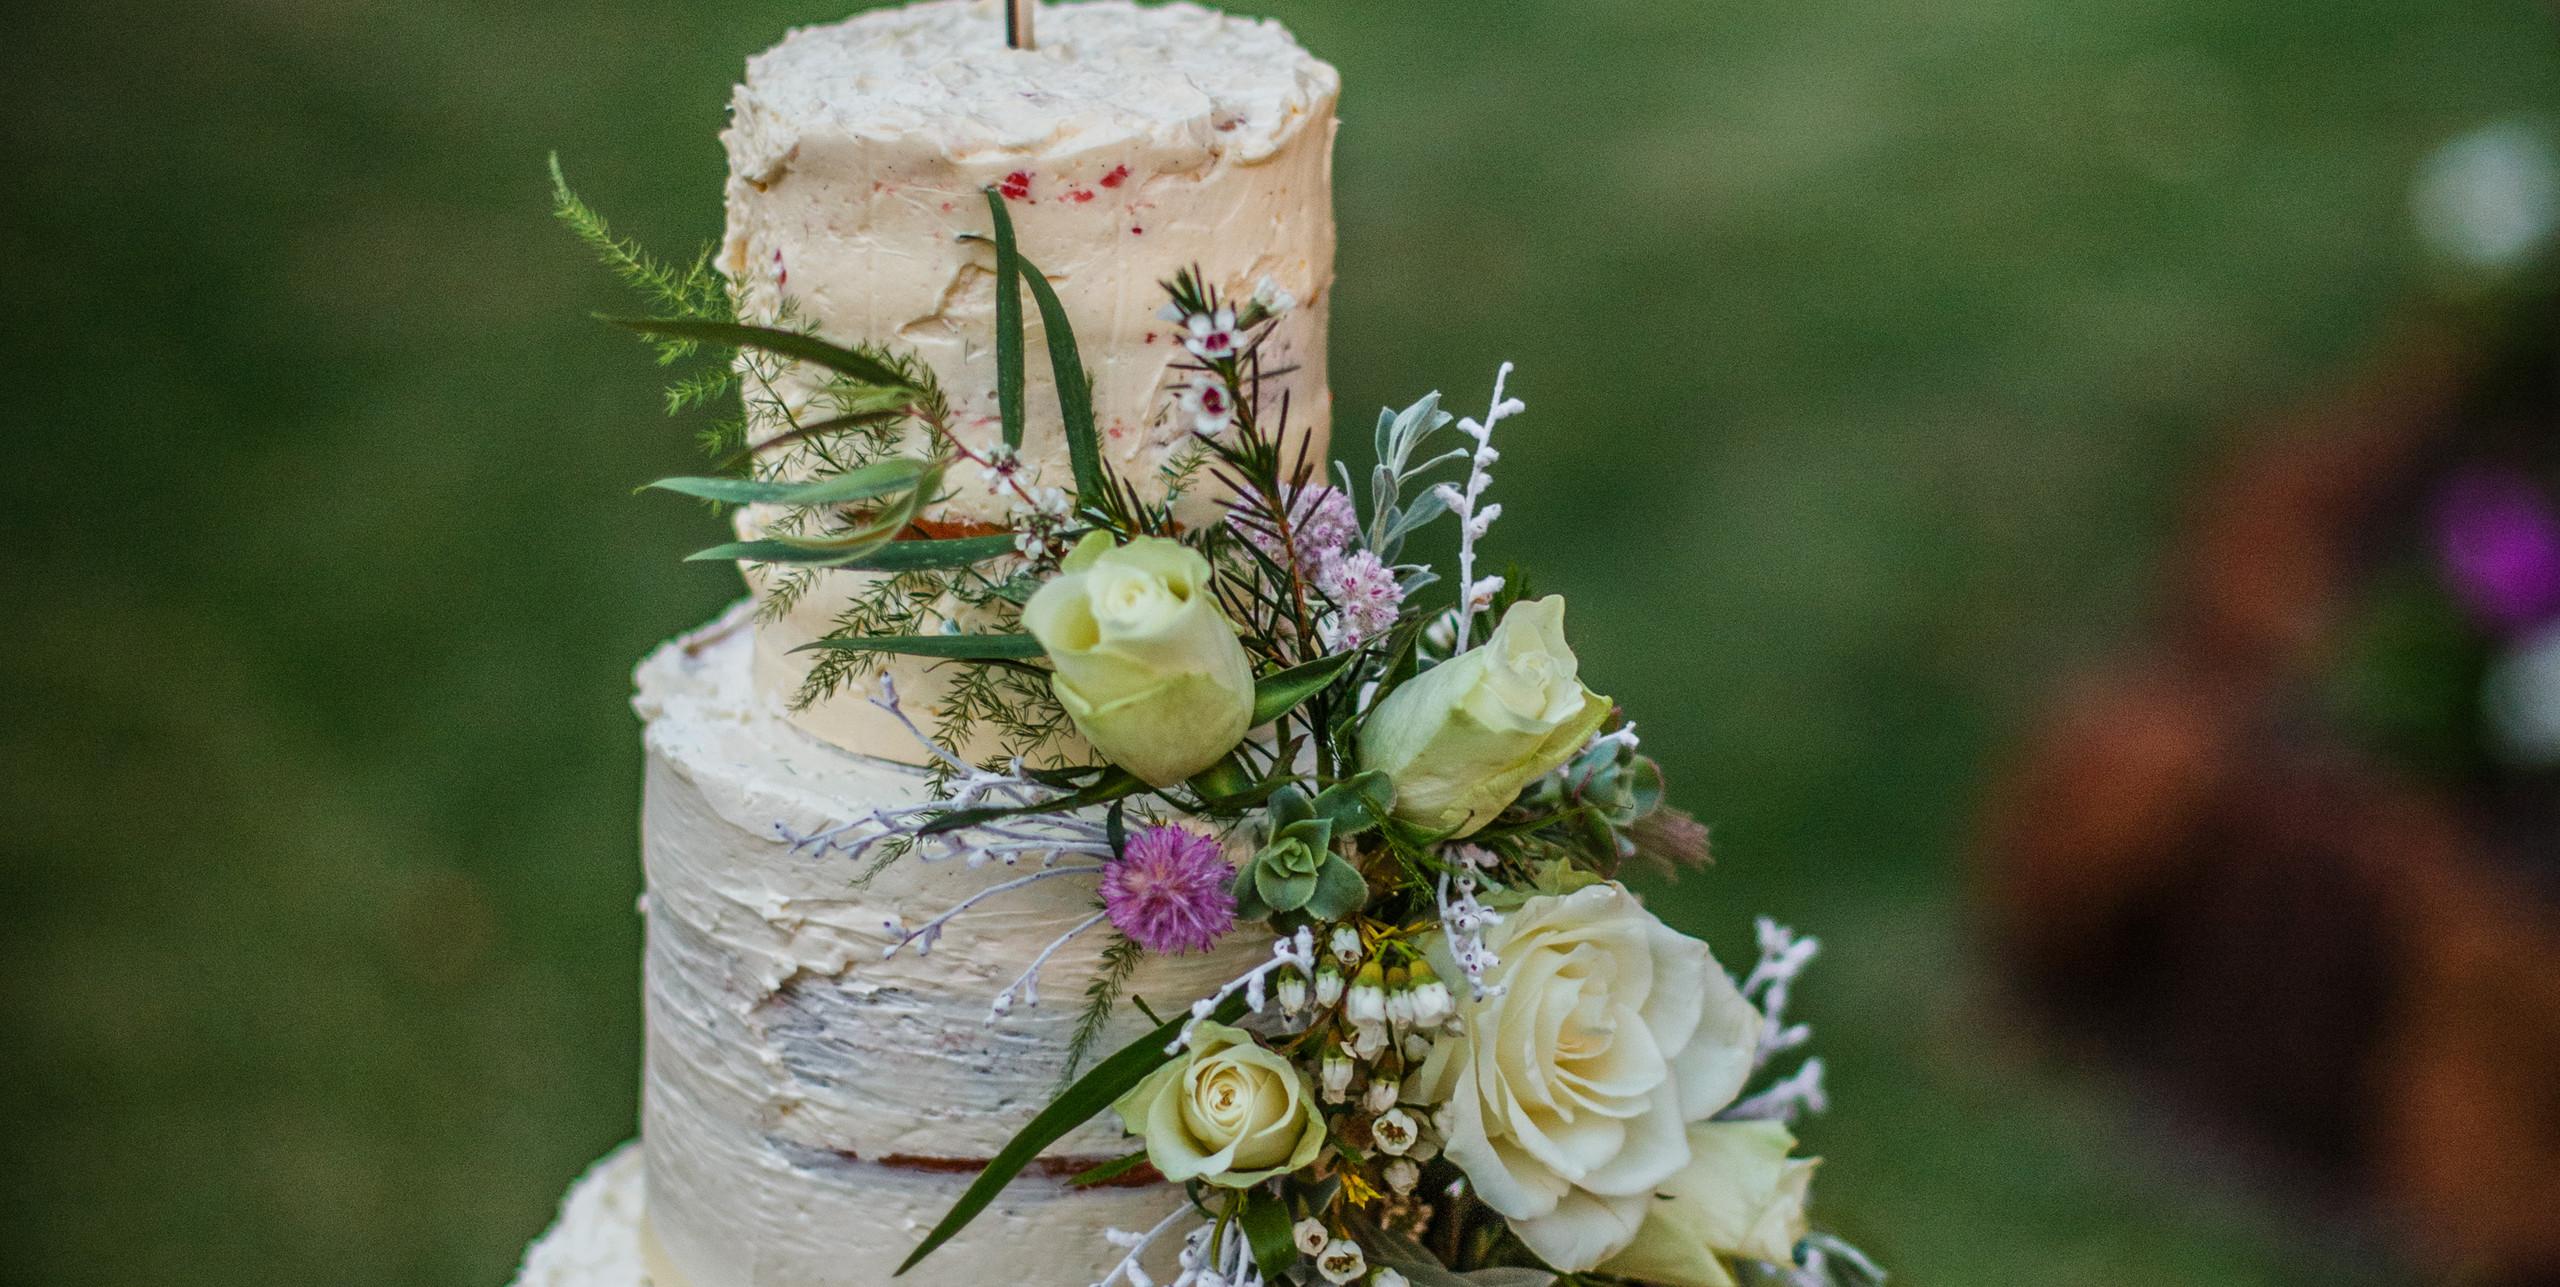 Rustic Wedding Cake \\ Fine Line Photography